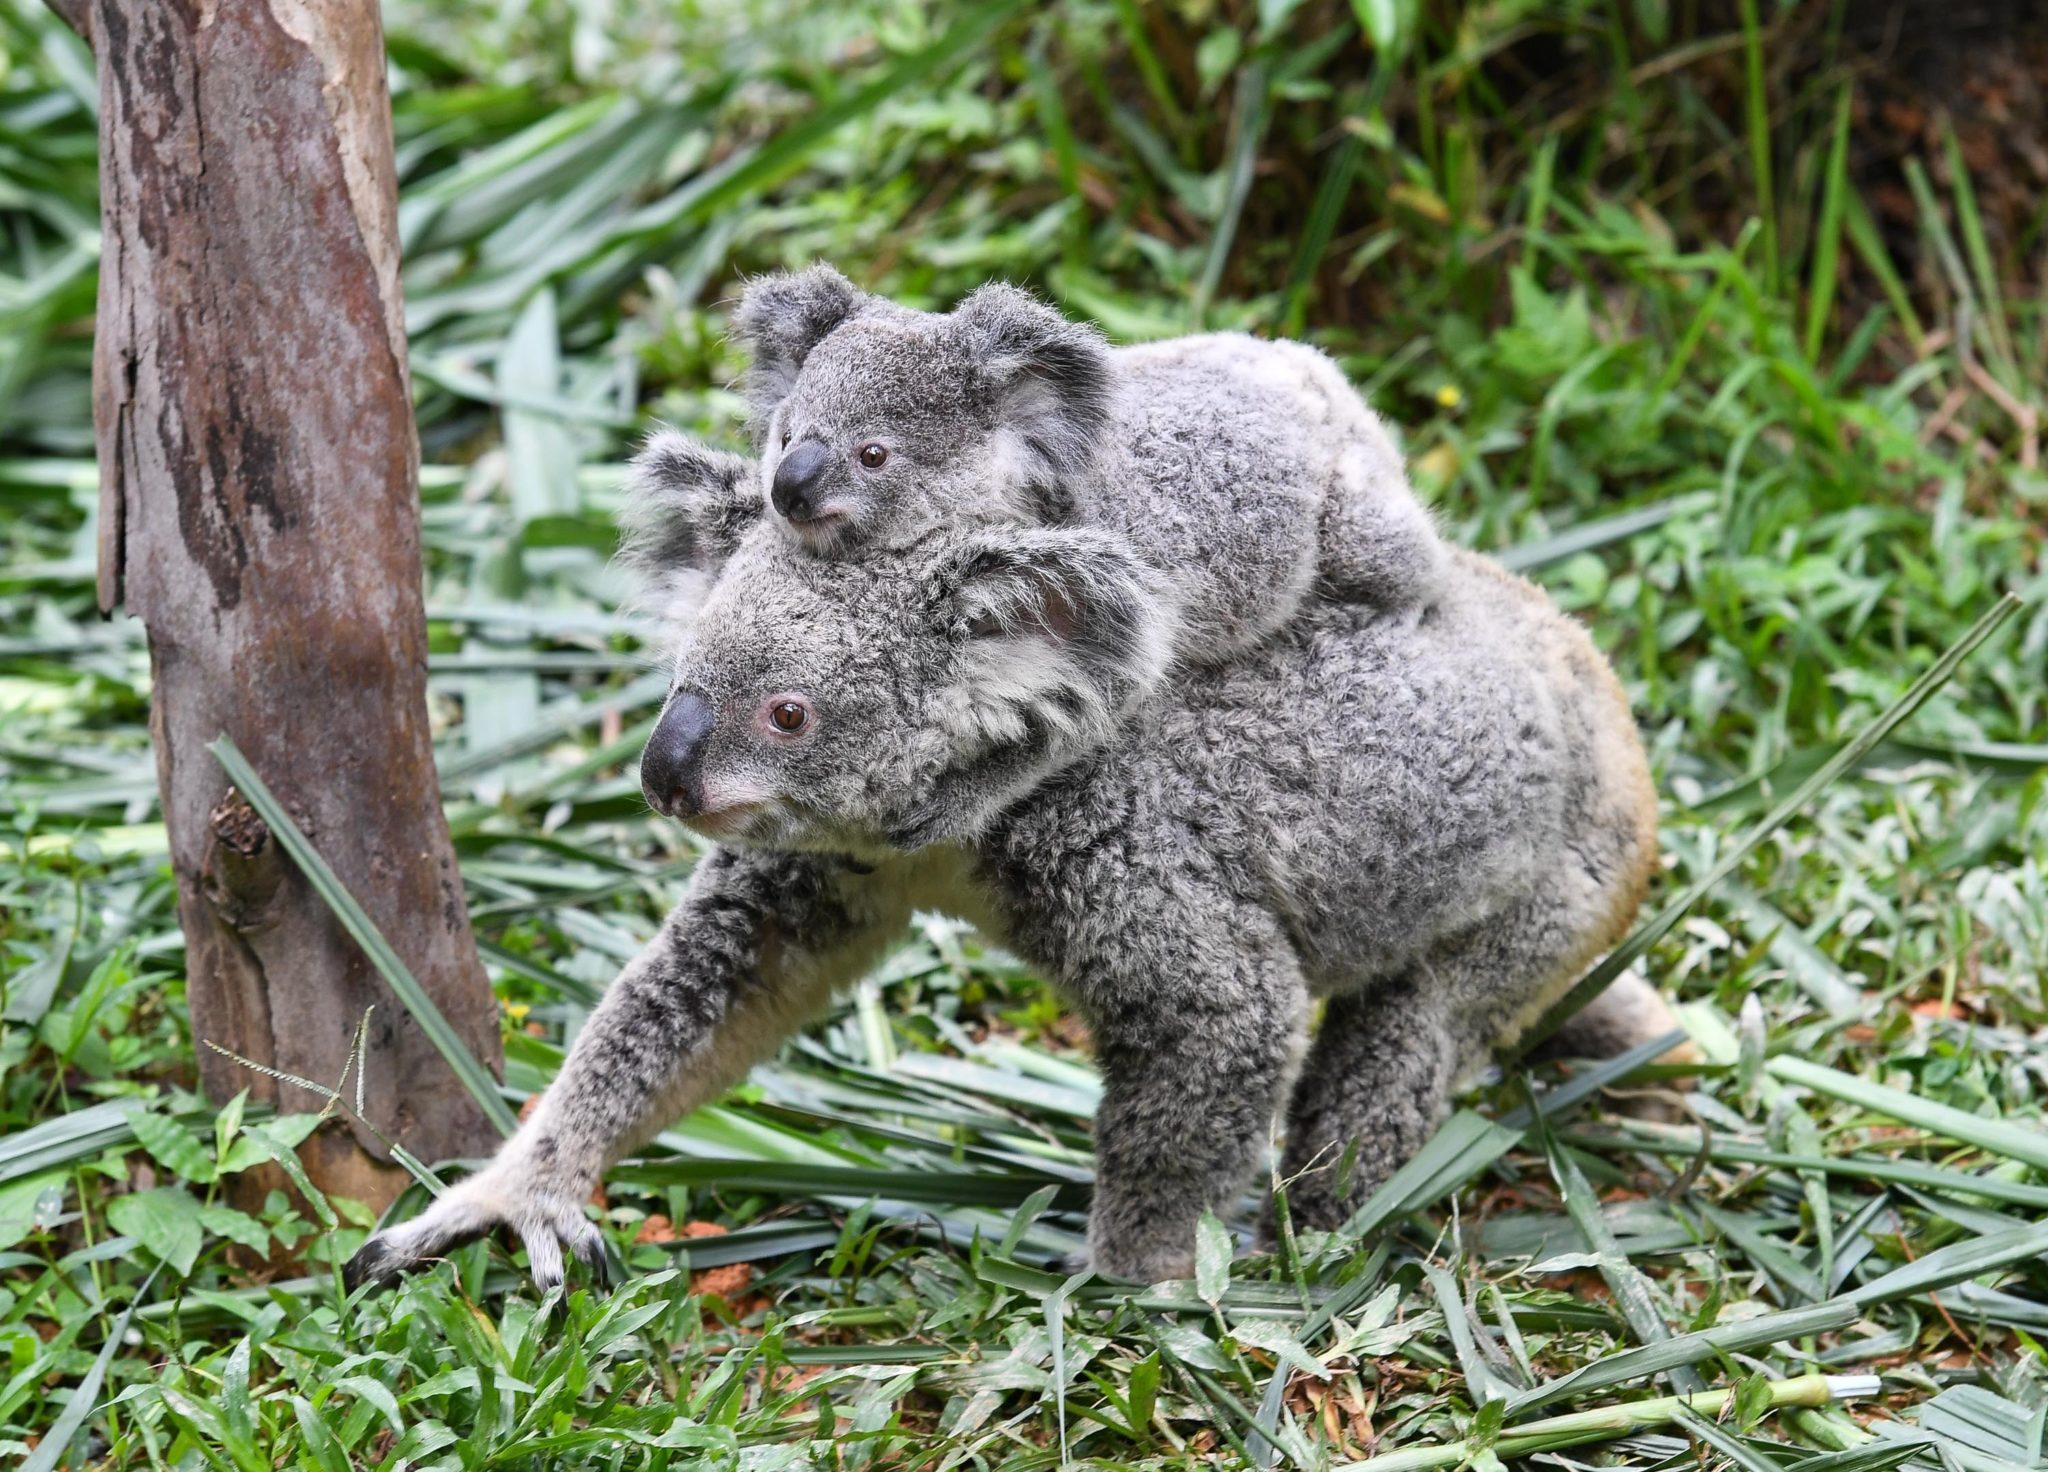 Charity Working To Save Koalas From Australian Bushfires Raises 900 000 Newstalk